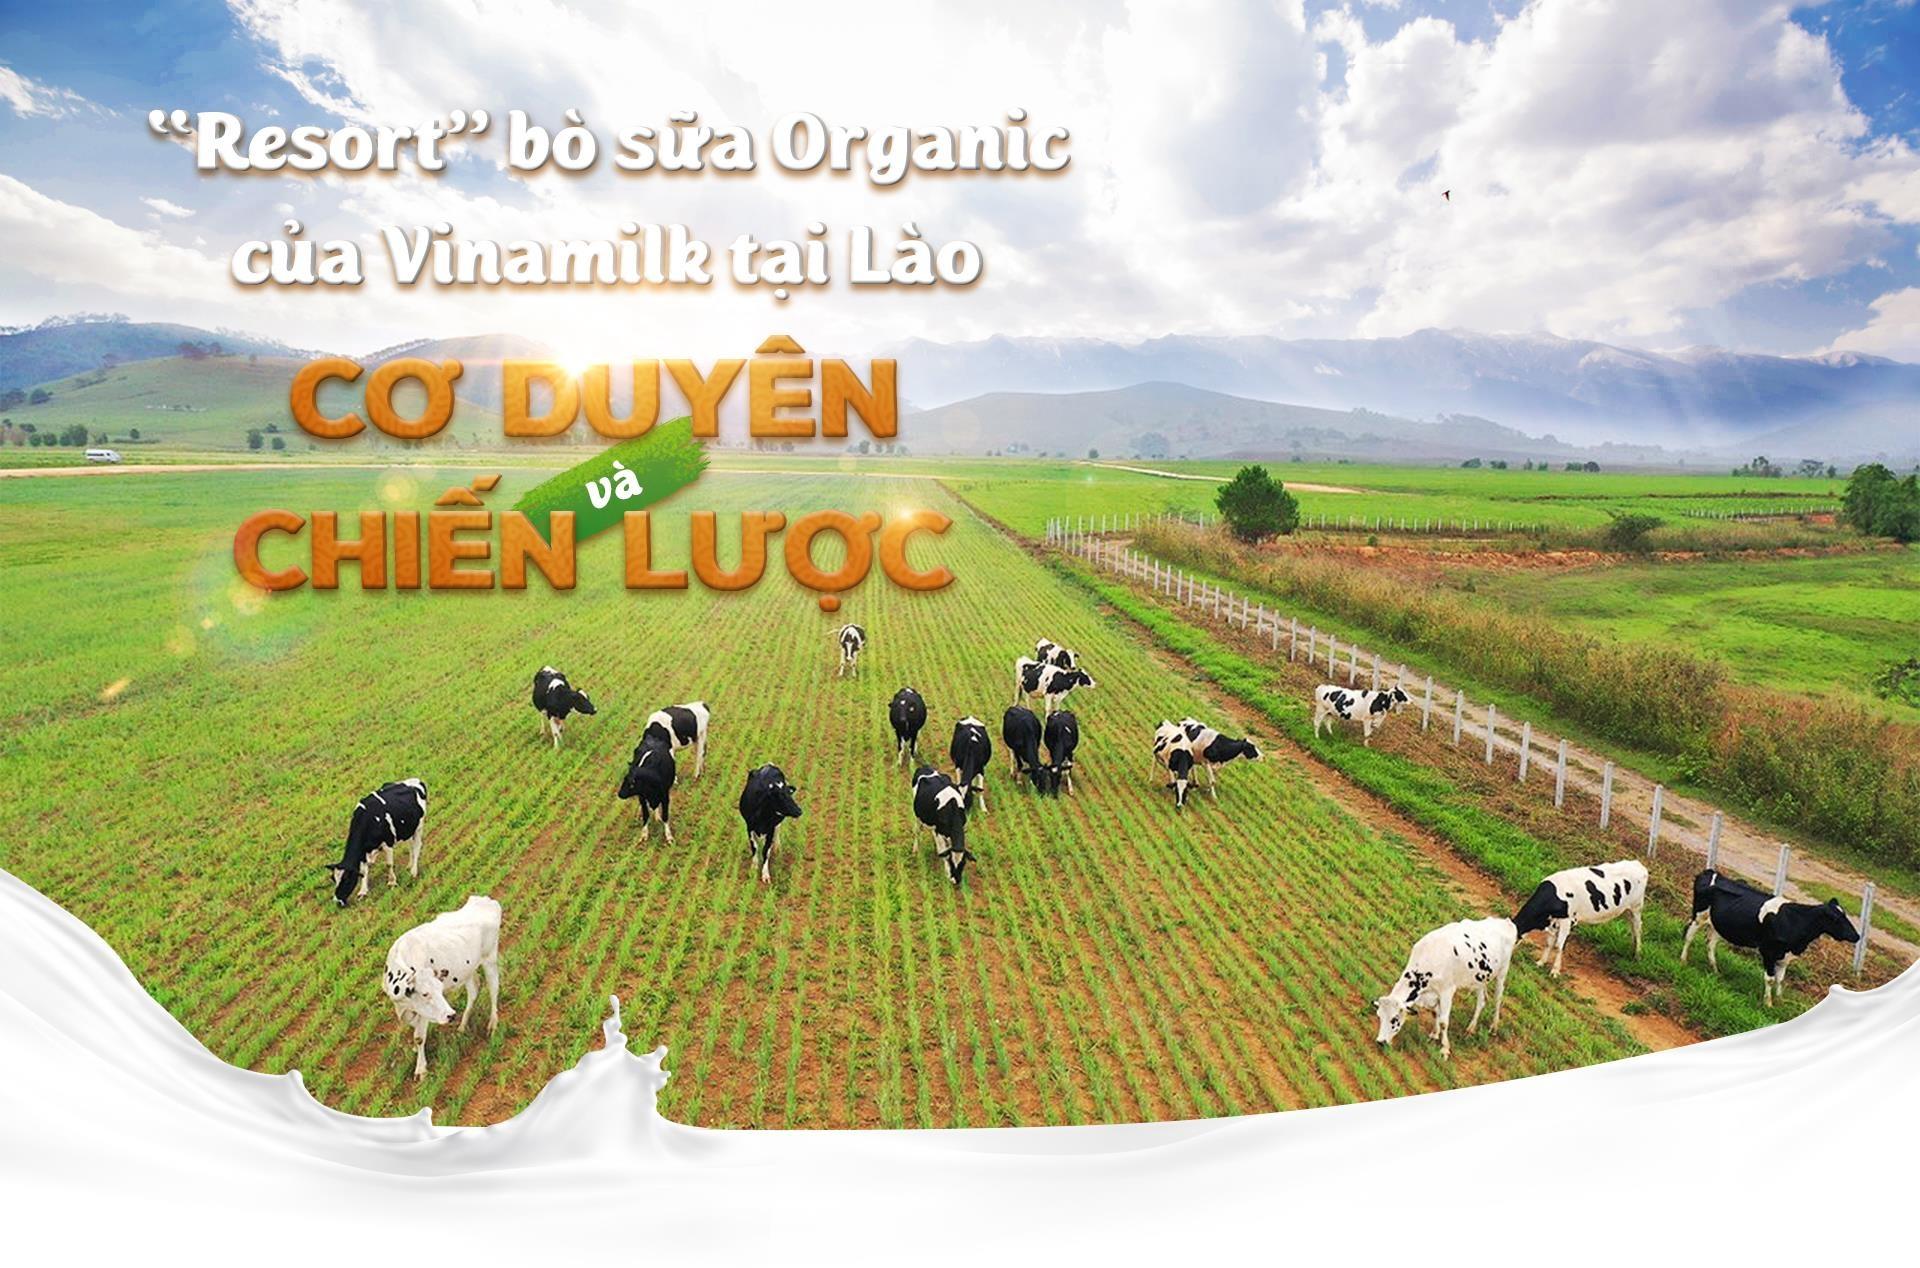 'Resort' bo sua organic cua Vinamilk tai Lao - co duyen va chien luoc hinh anh 2